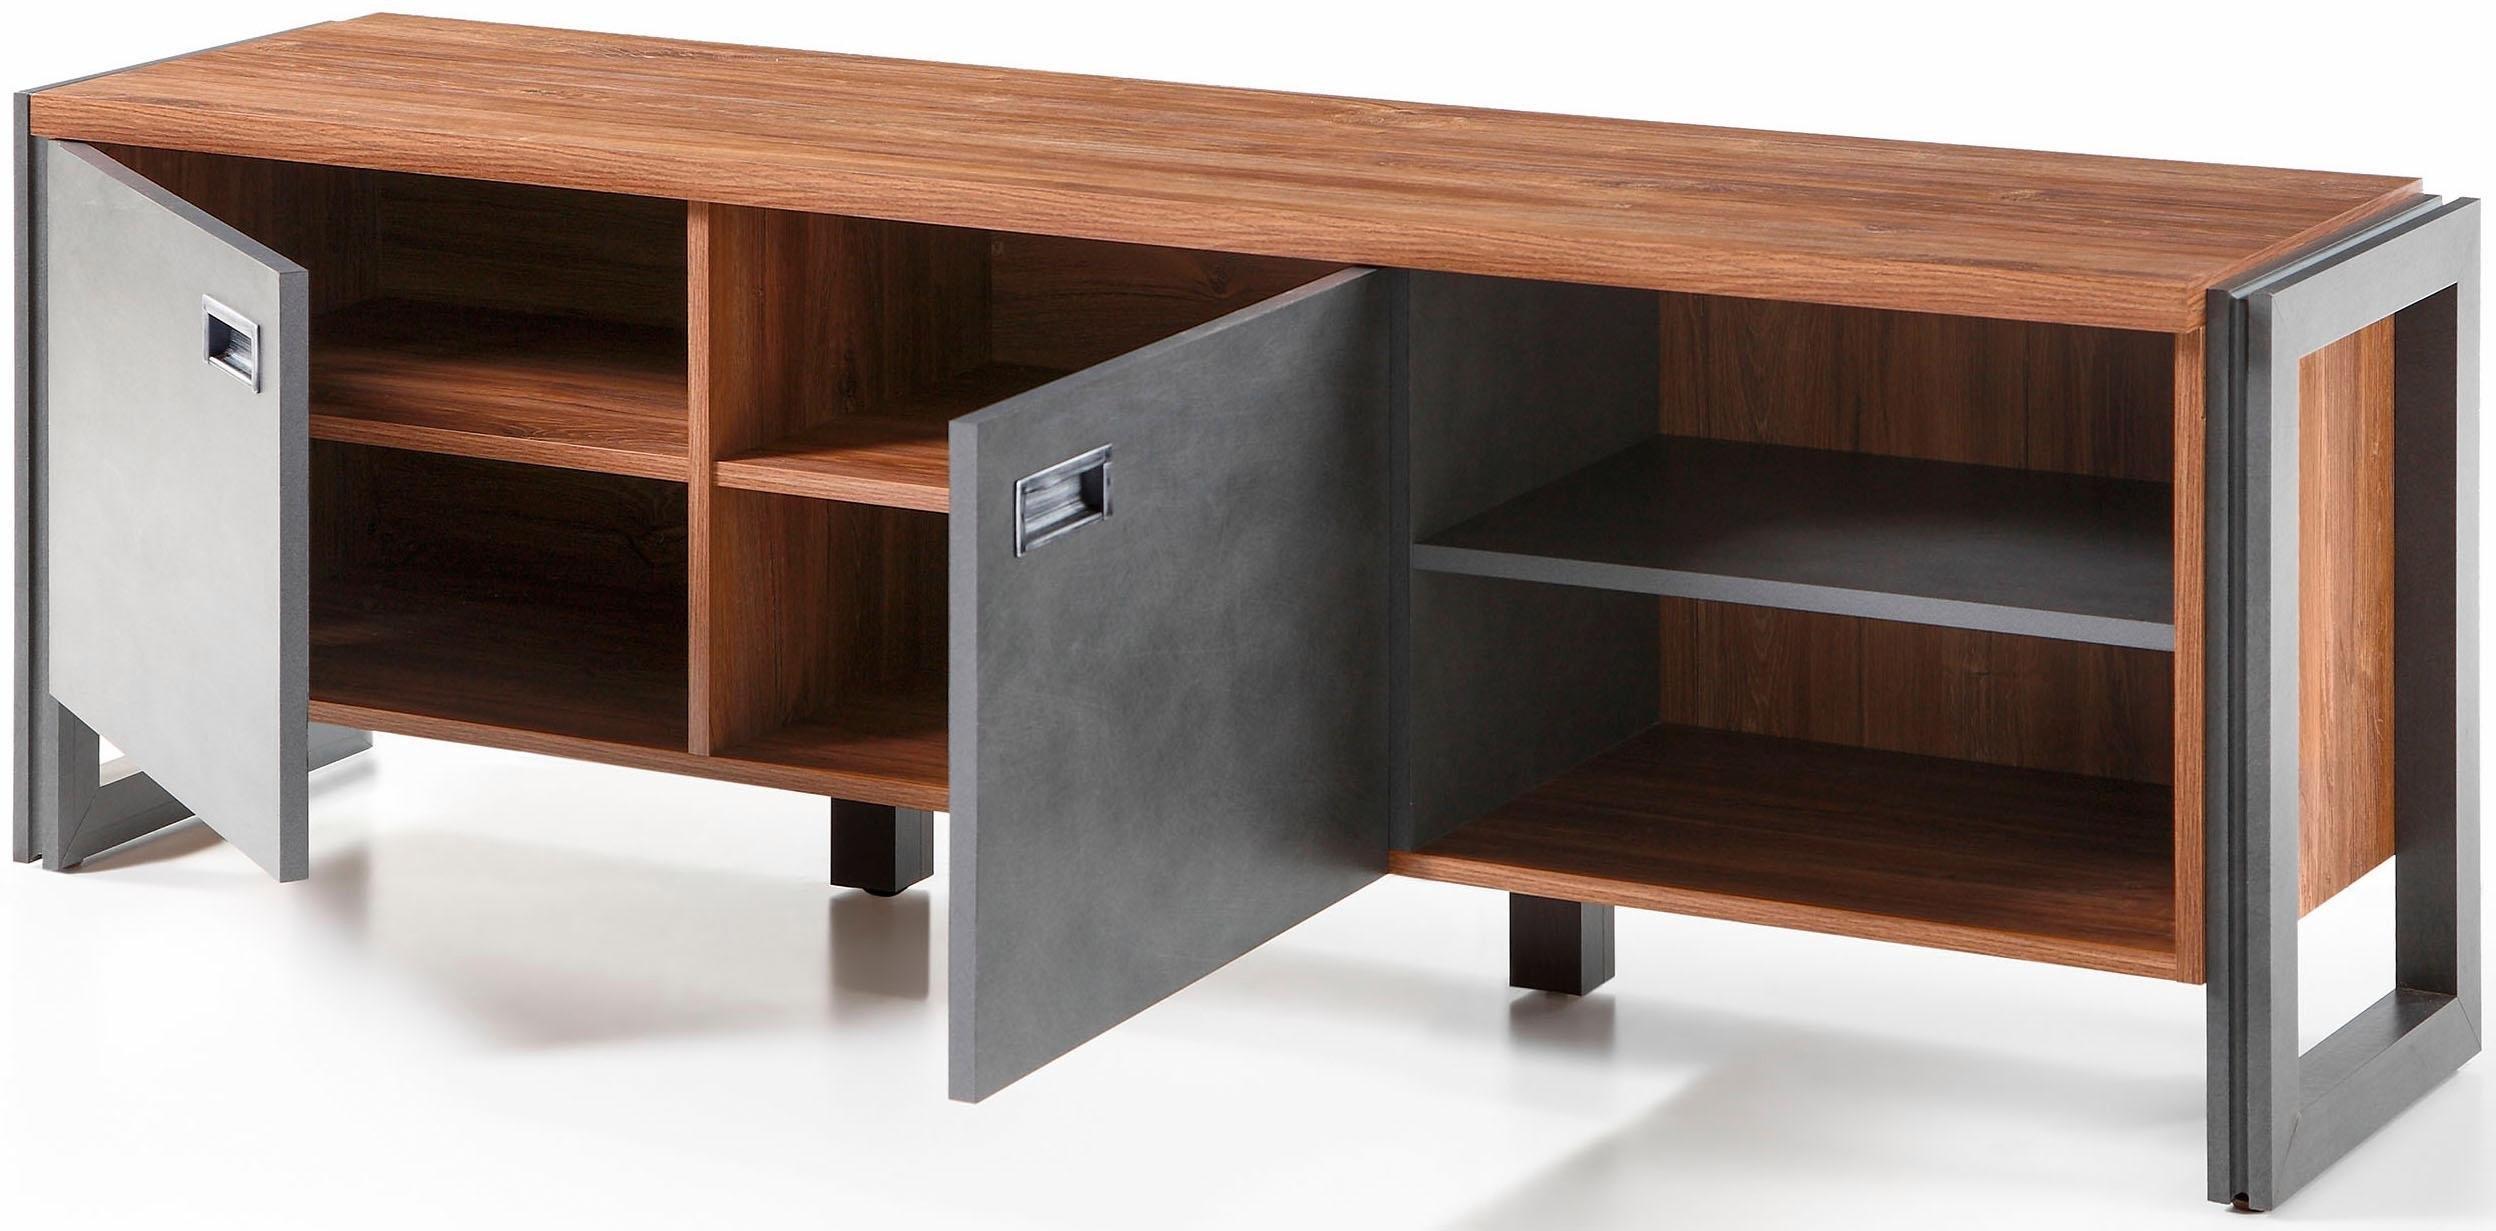 home affaire lowboard detroit breedte 160 cm in trendy industri le look koop je bij otto. Black Bedroom Furniture Sets. Home Design Ideas